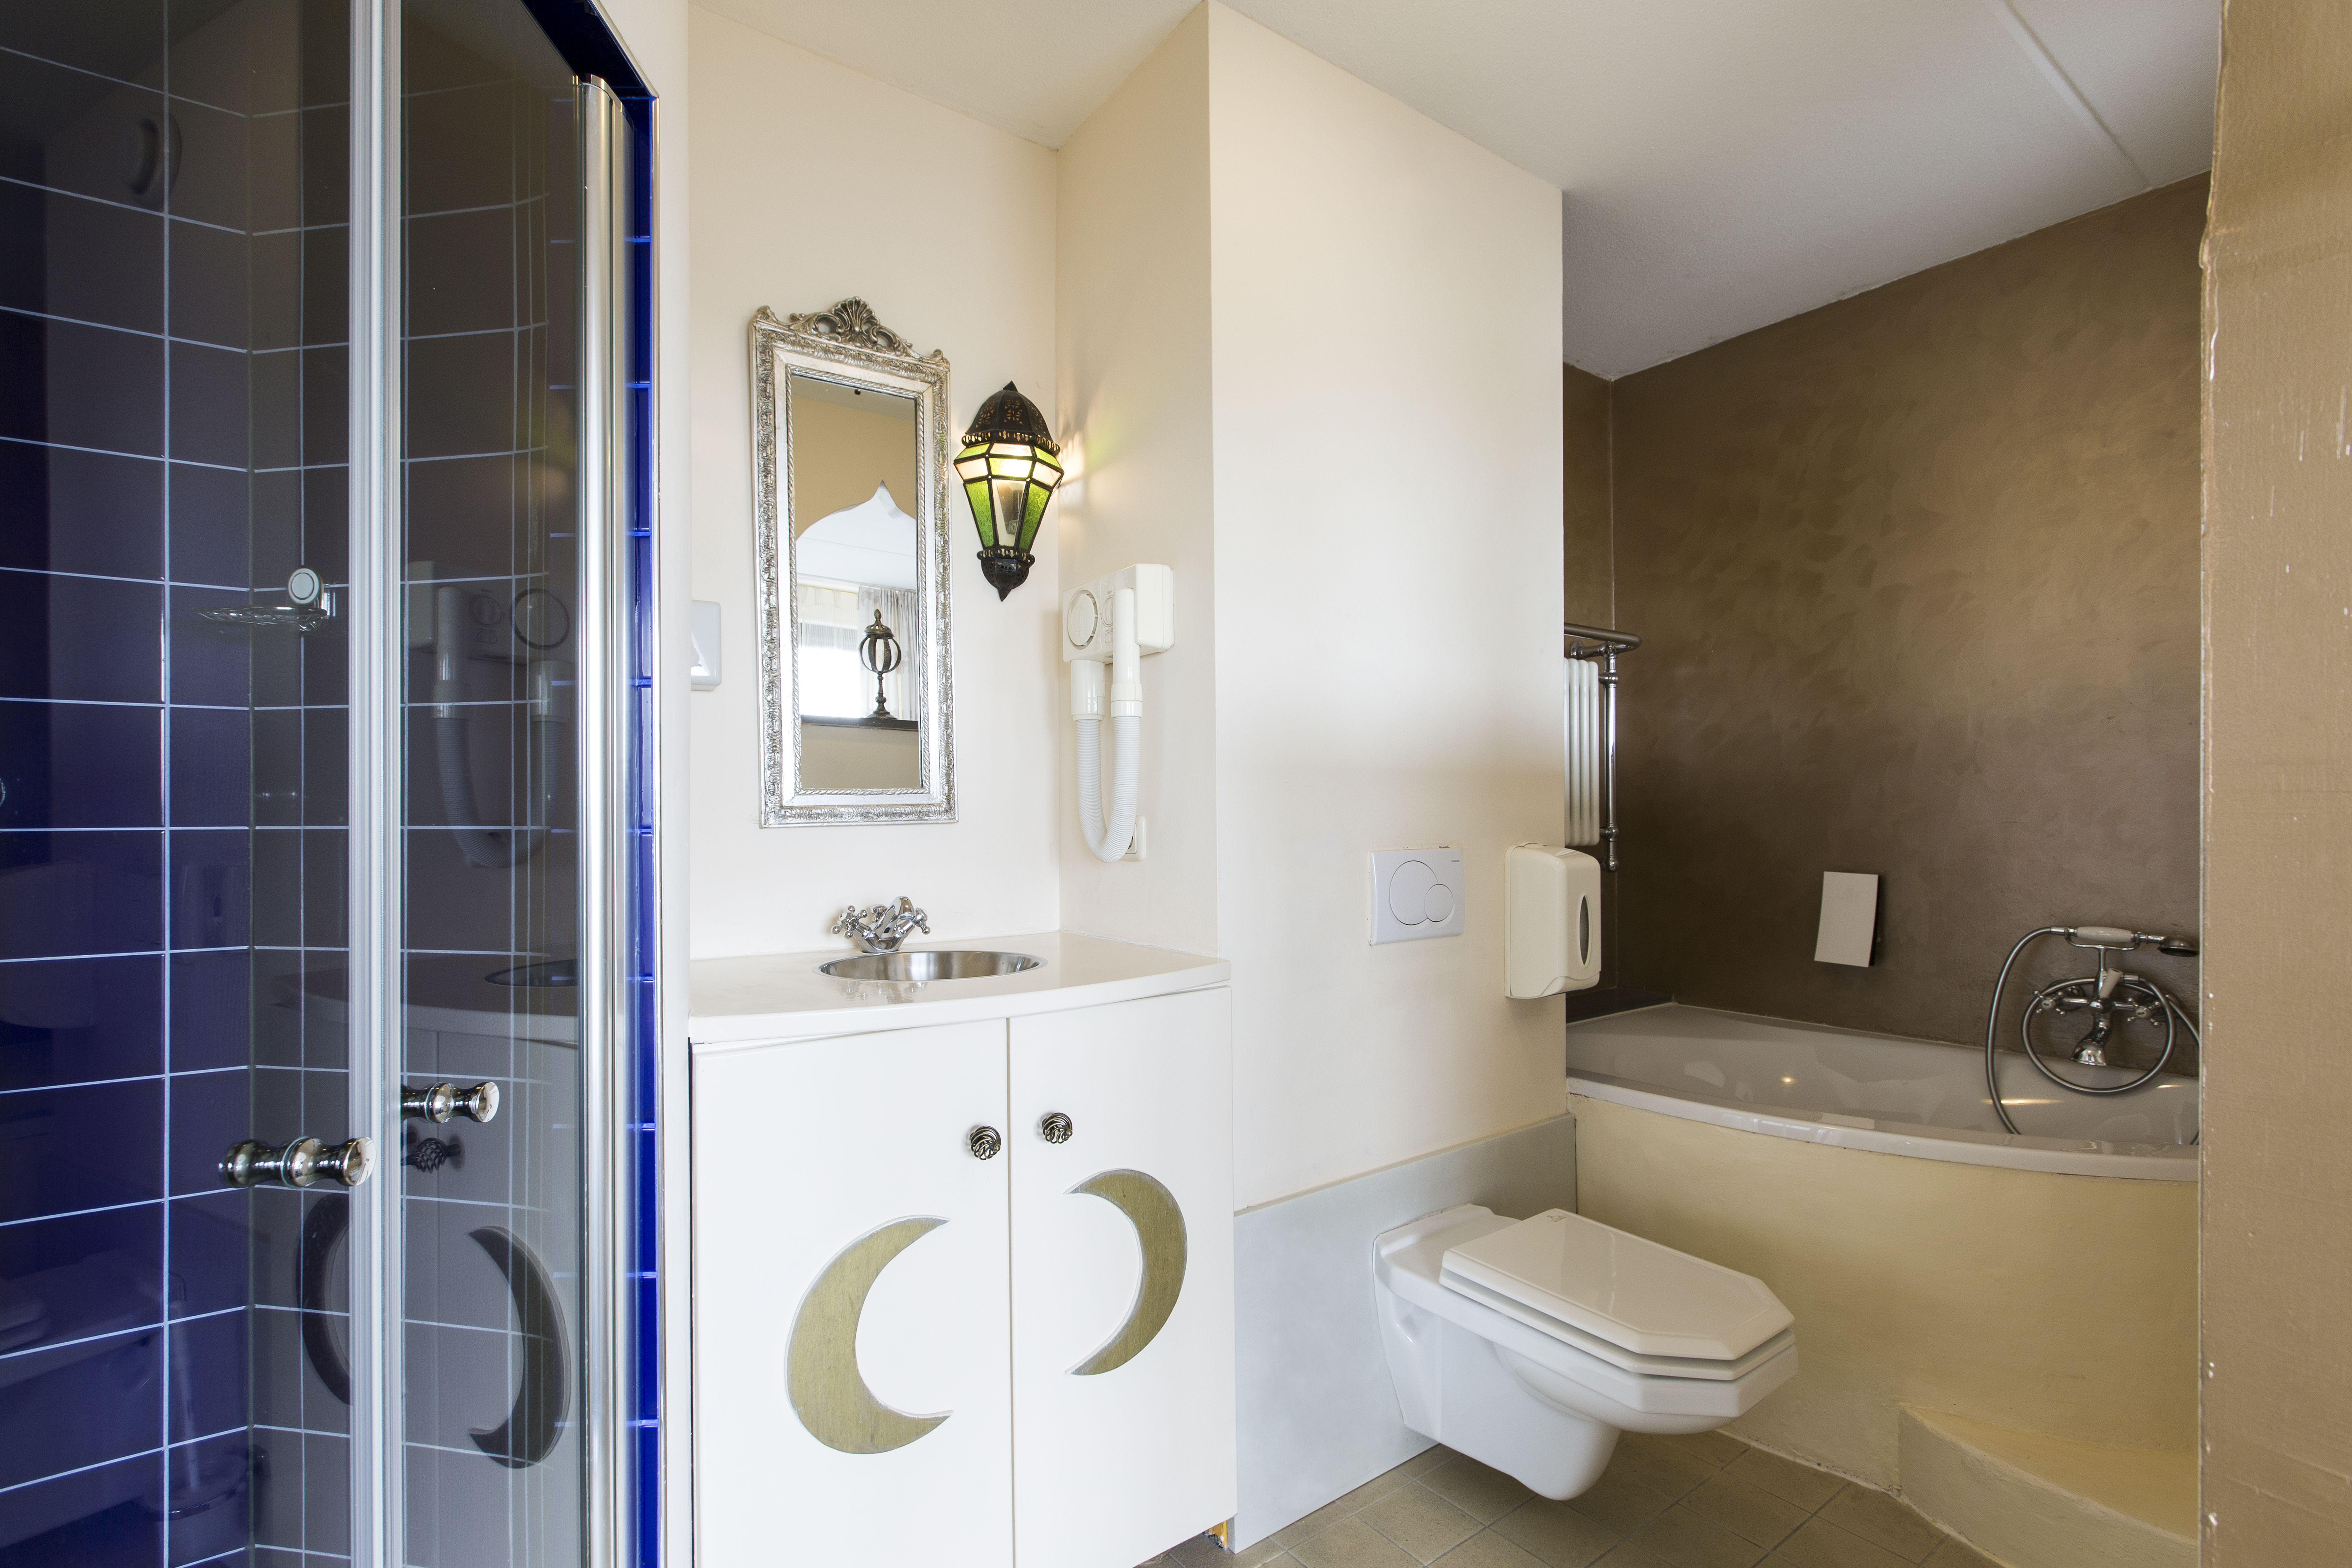 Badkamer Showroom Drenthe : Badkamermeubels emmen bathroom wanda grando keukens bad